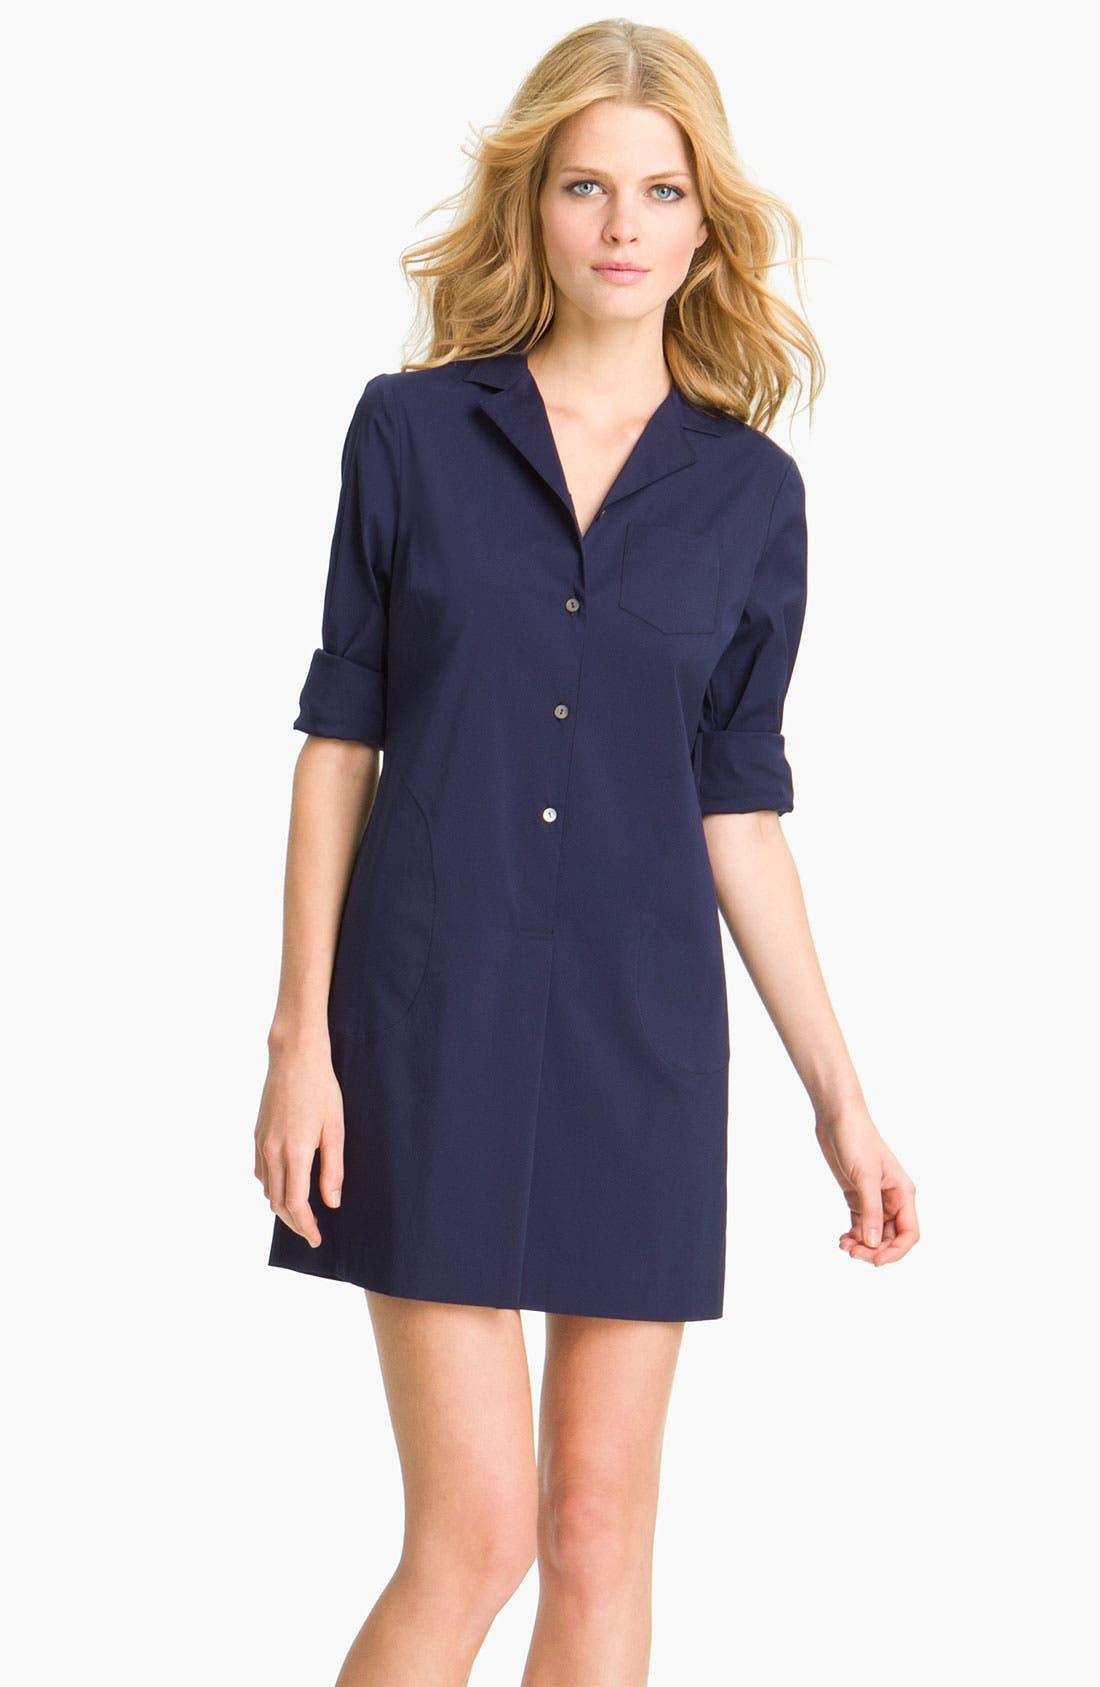 Alternate Image 1 Selected - Theory 'Madlaina - Luxe' Shirtdress